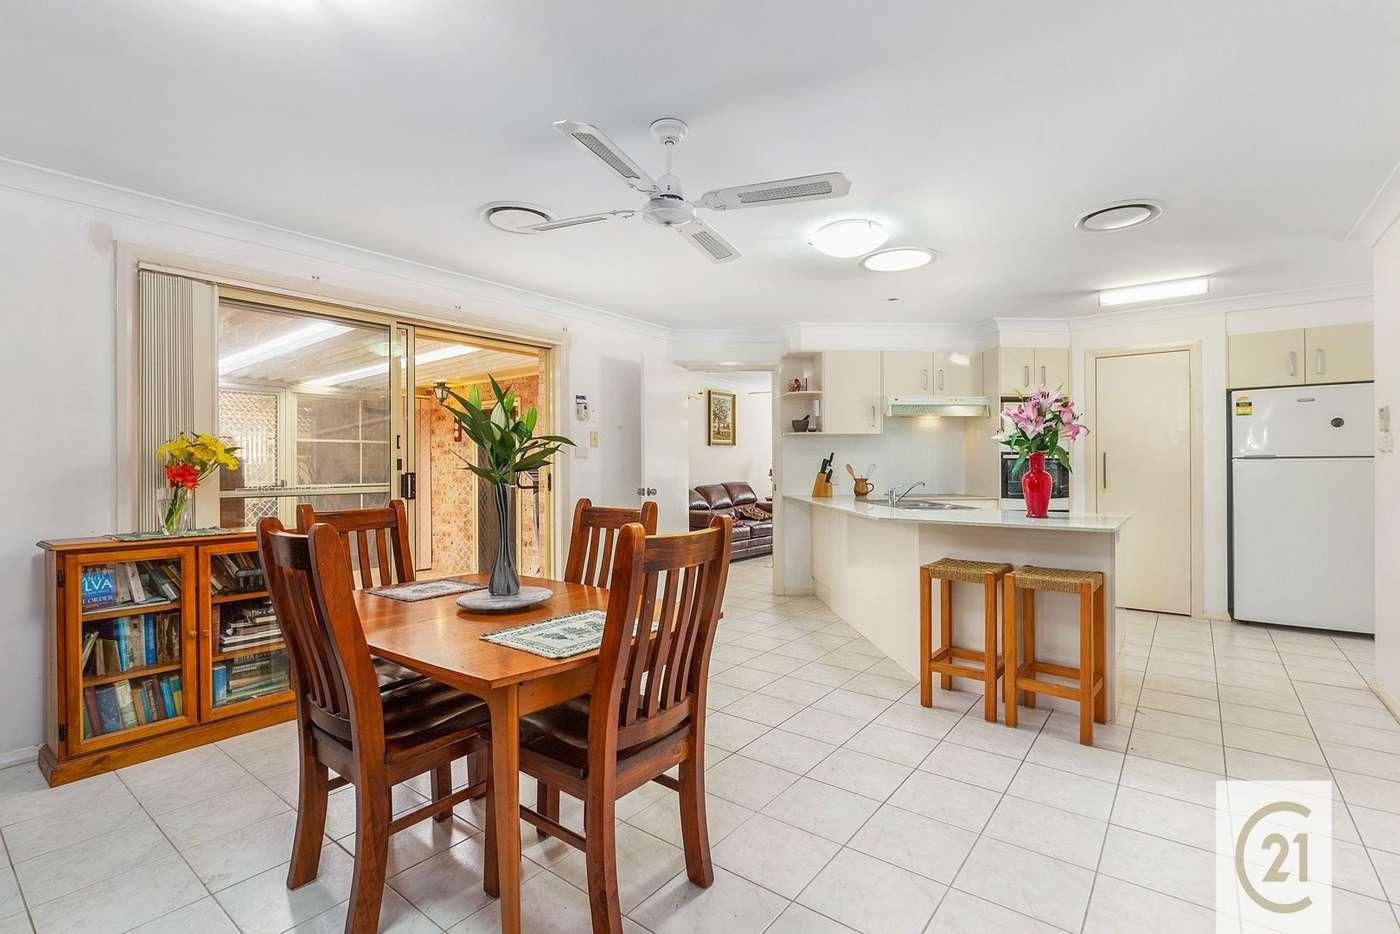 Main view of Homely house listing, 23 Shores Close, Salamander Bay NSW 2317